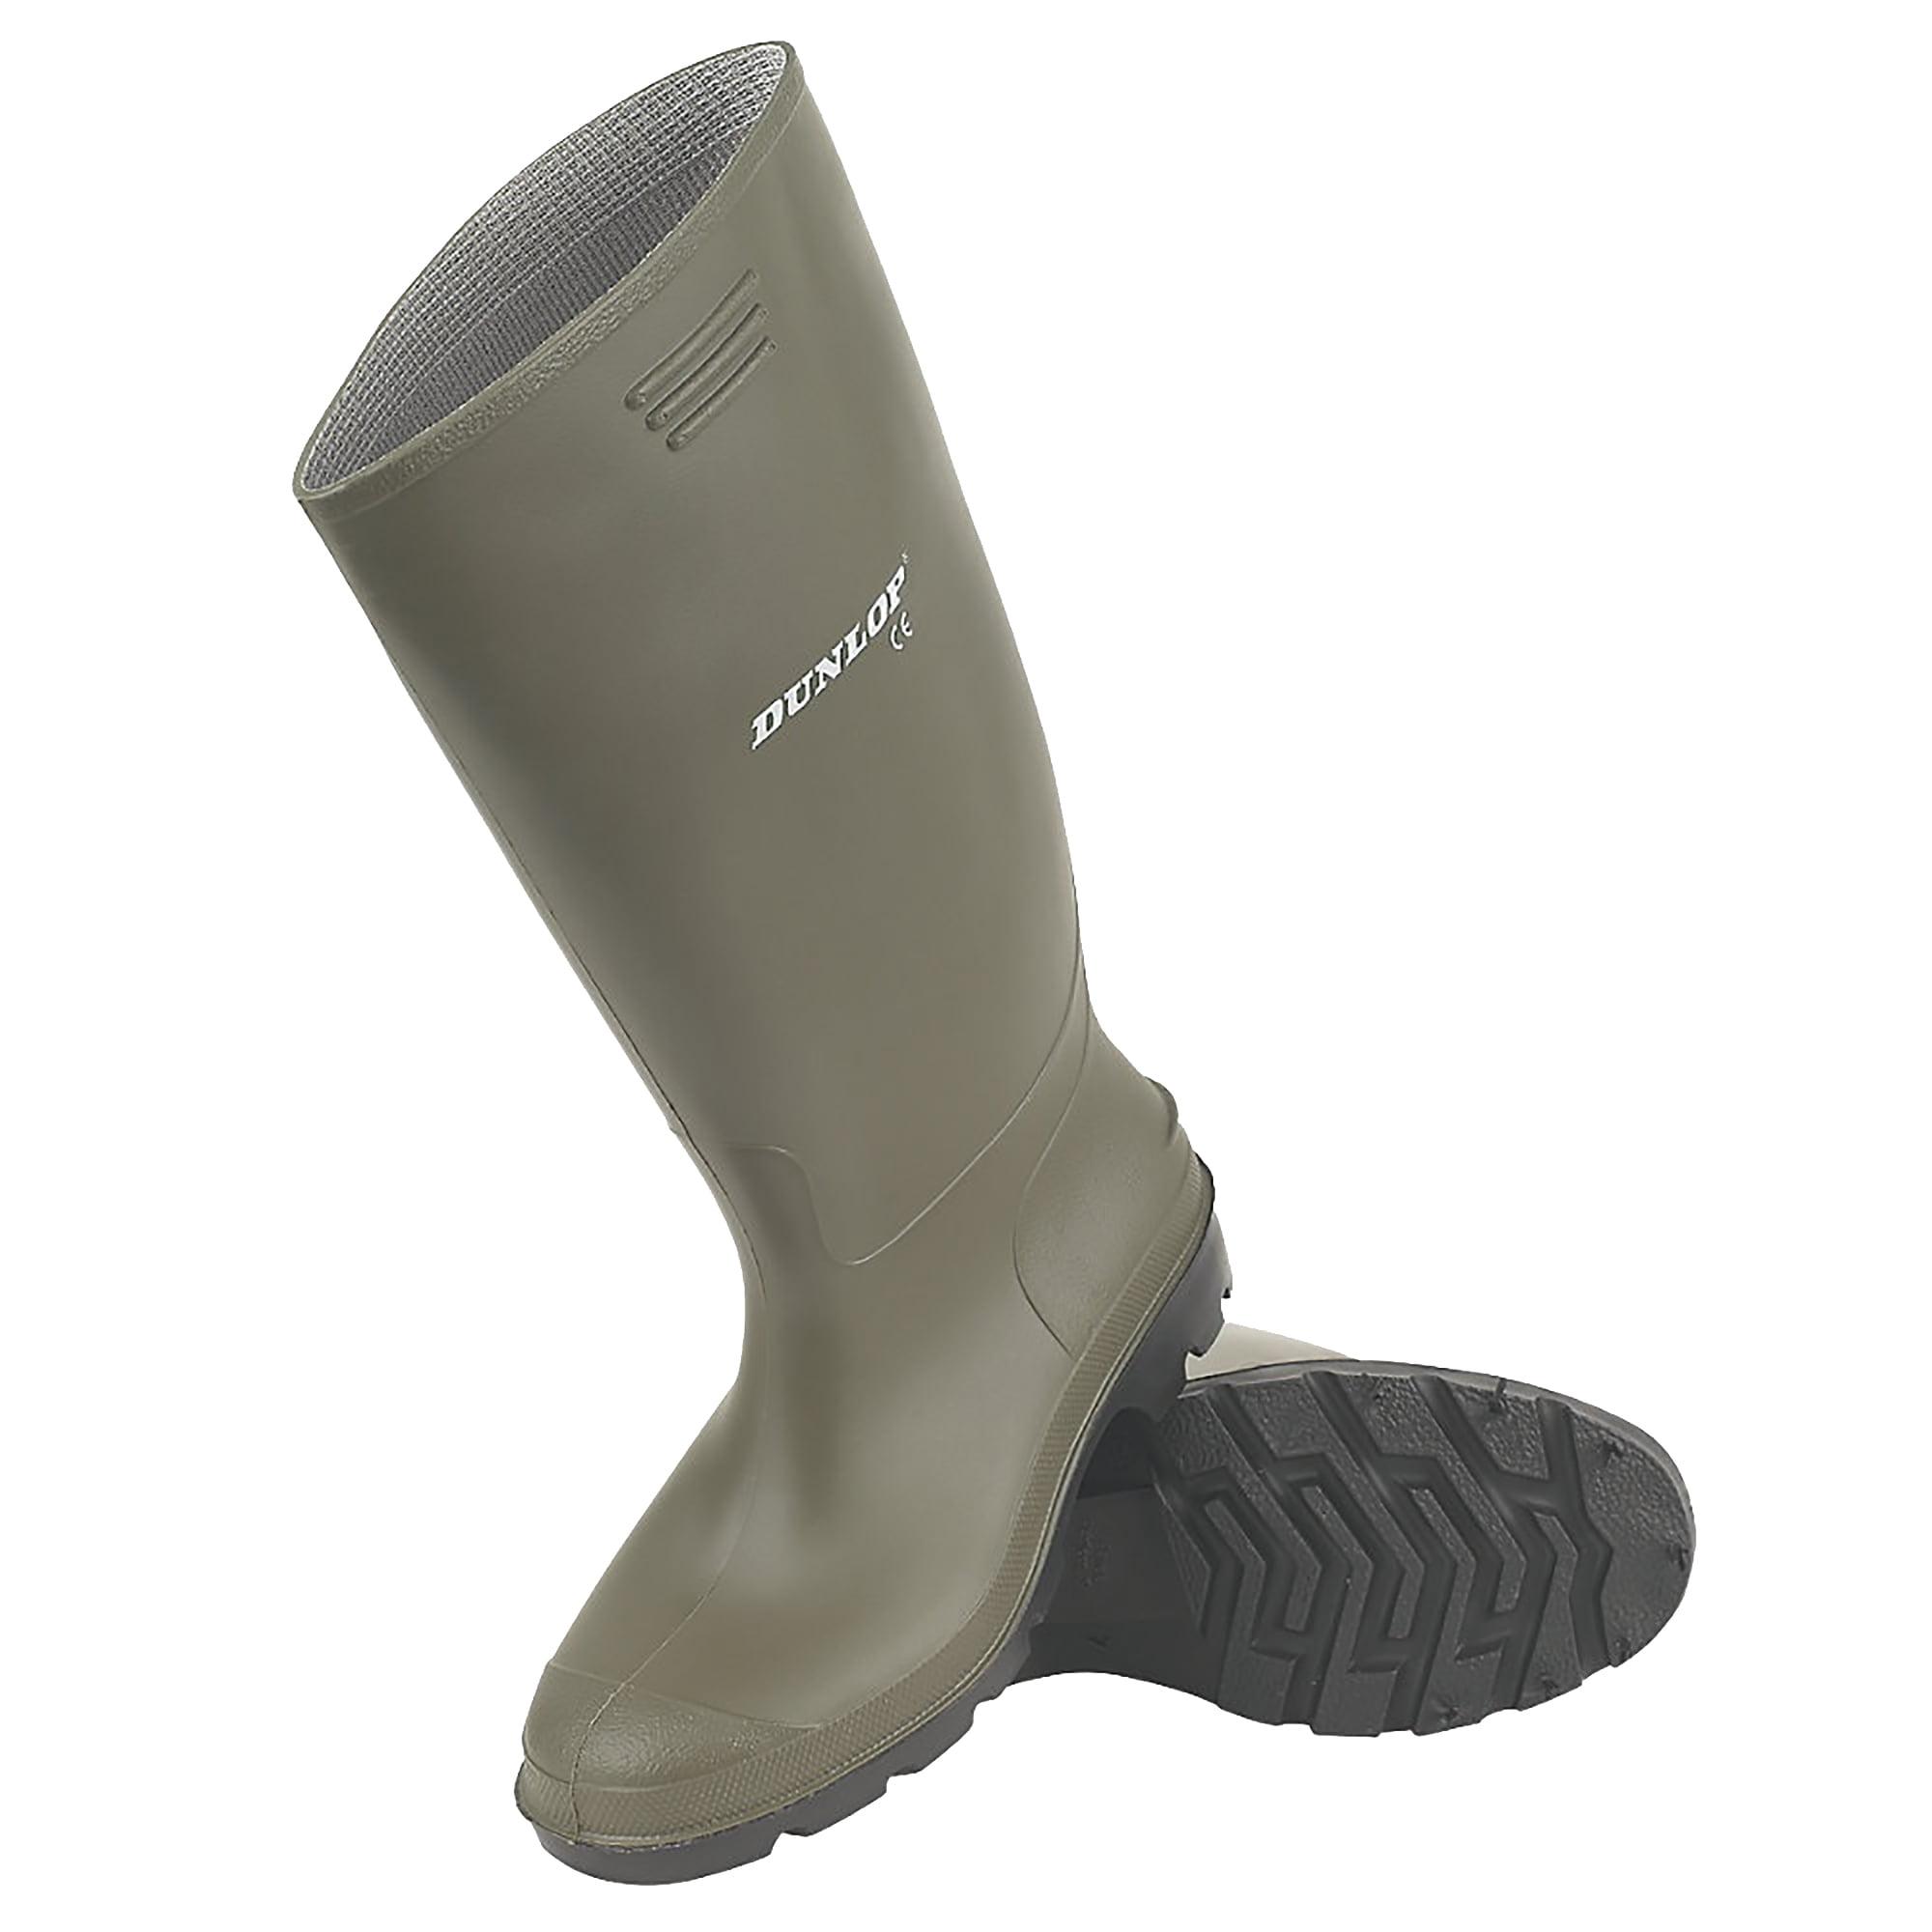 Dunlop 380PP Pricemastor Wellington Boot Fully Waterproof PVC Wellies Work Welly